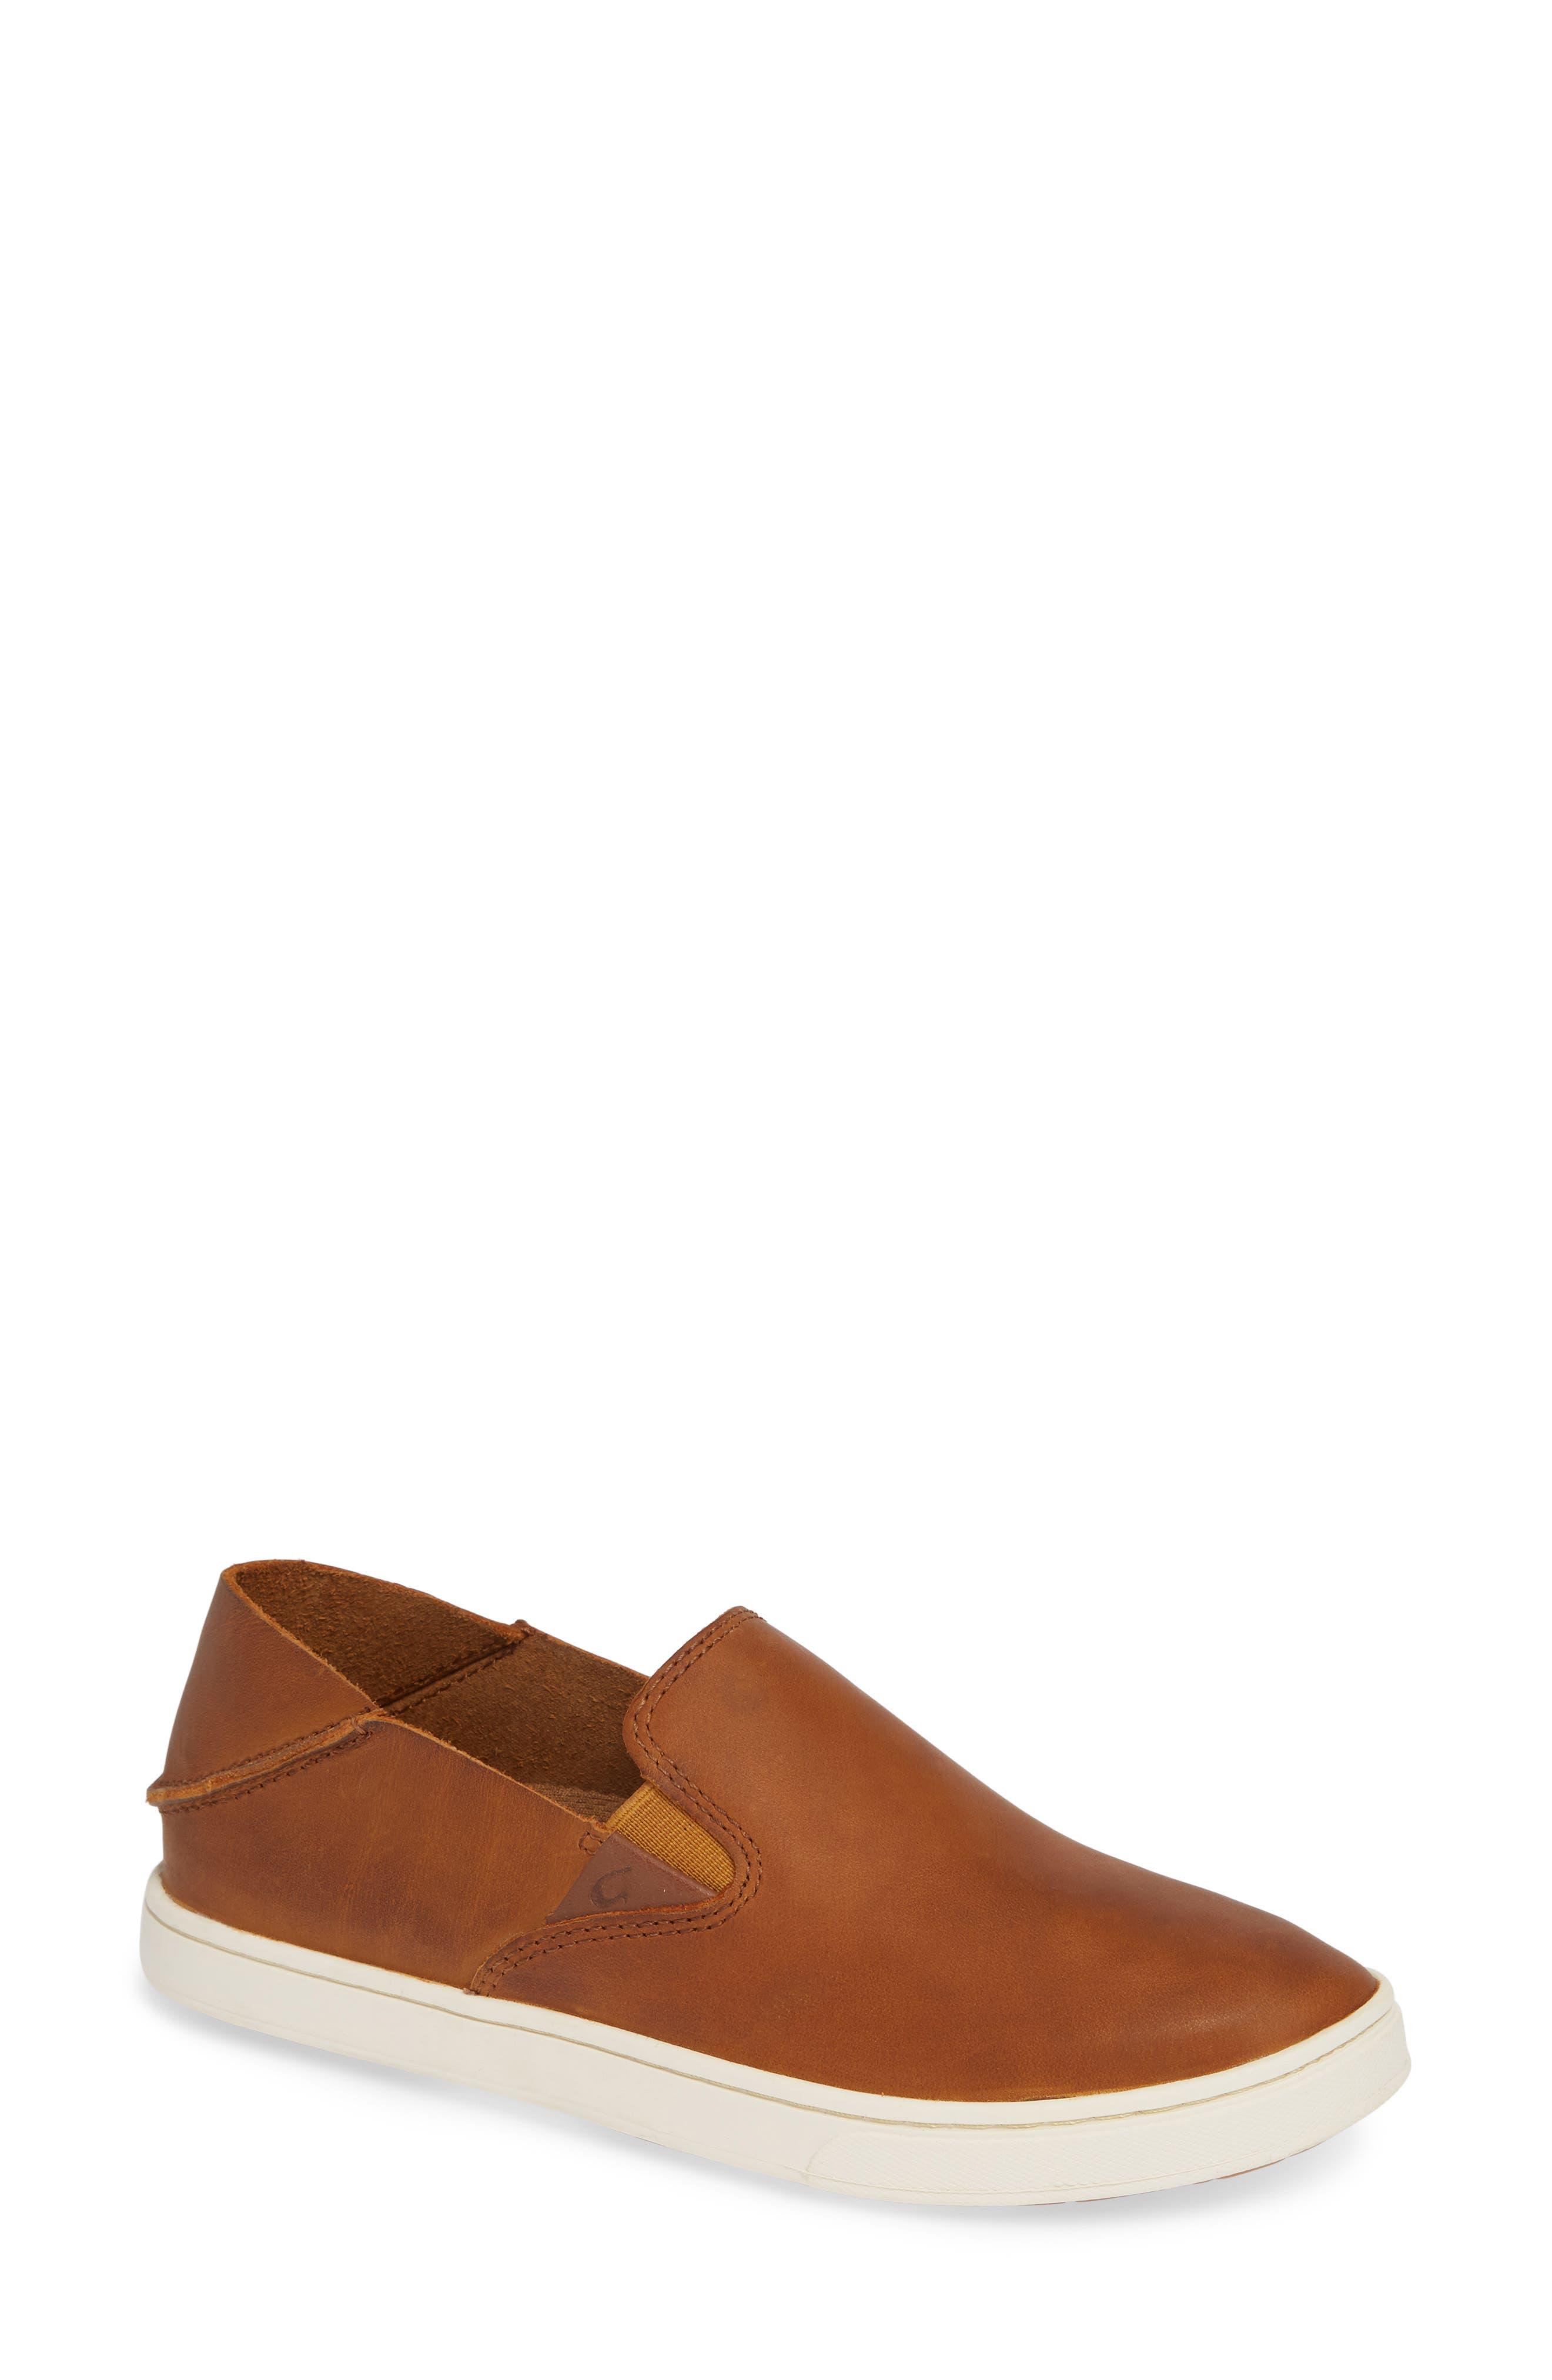 Olukai Pehuea Slip-On Sneaker, Brown